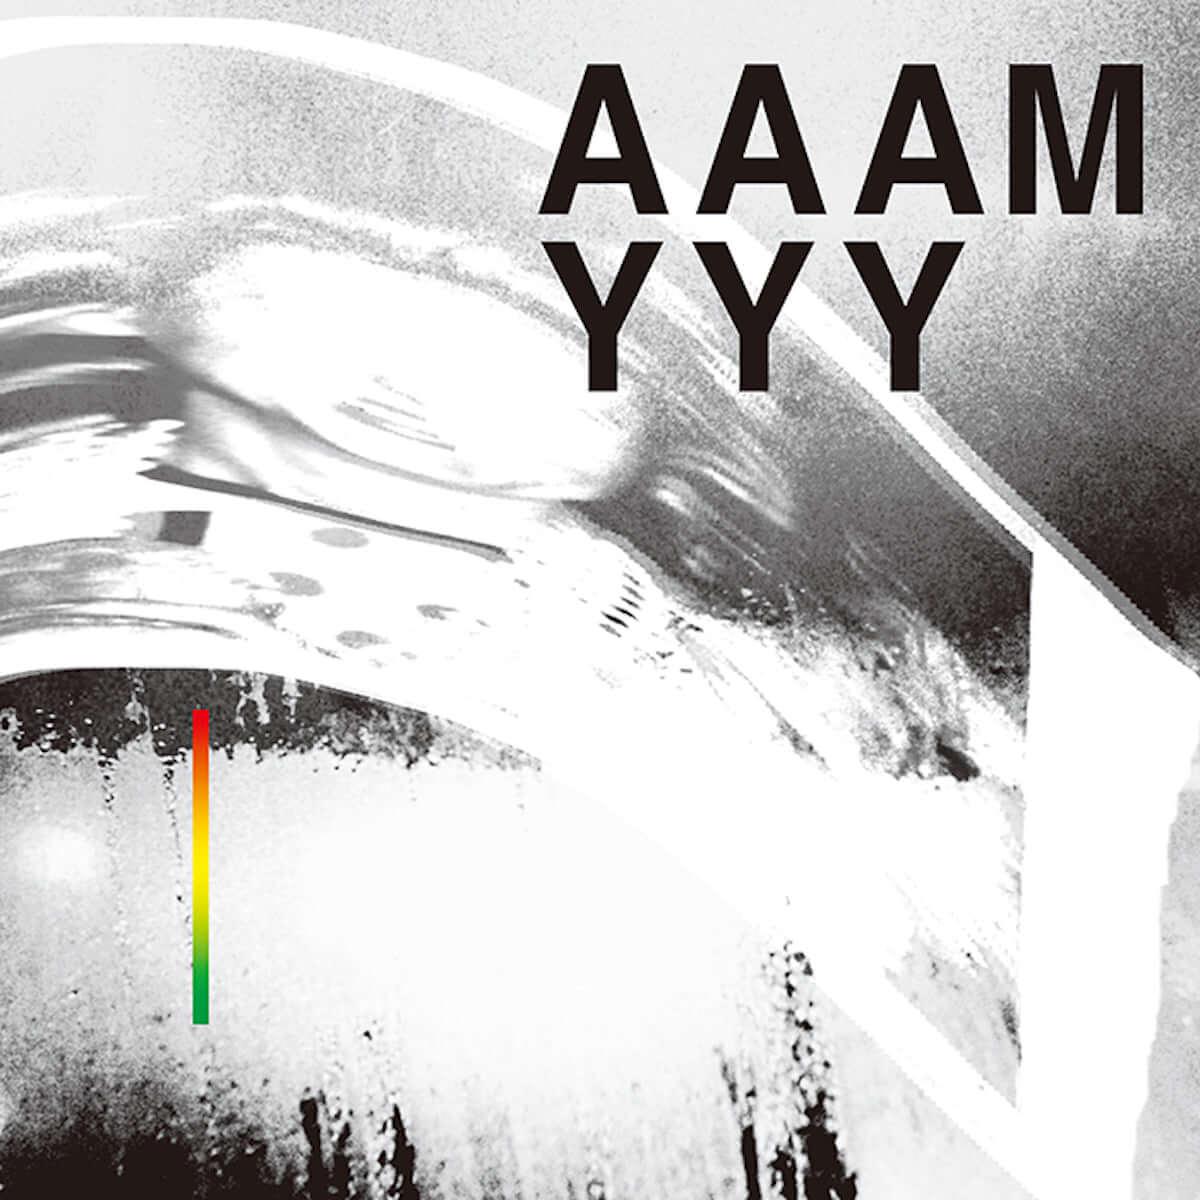 AAAMYYY、完全自主制作カセット3タイトルを収録したLPをリリース! music190311-aaamyyy-1-1200x1200